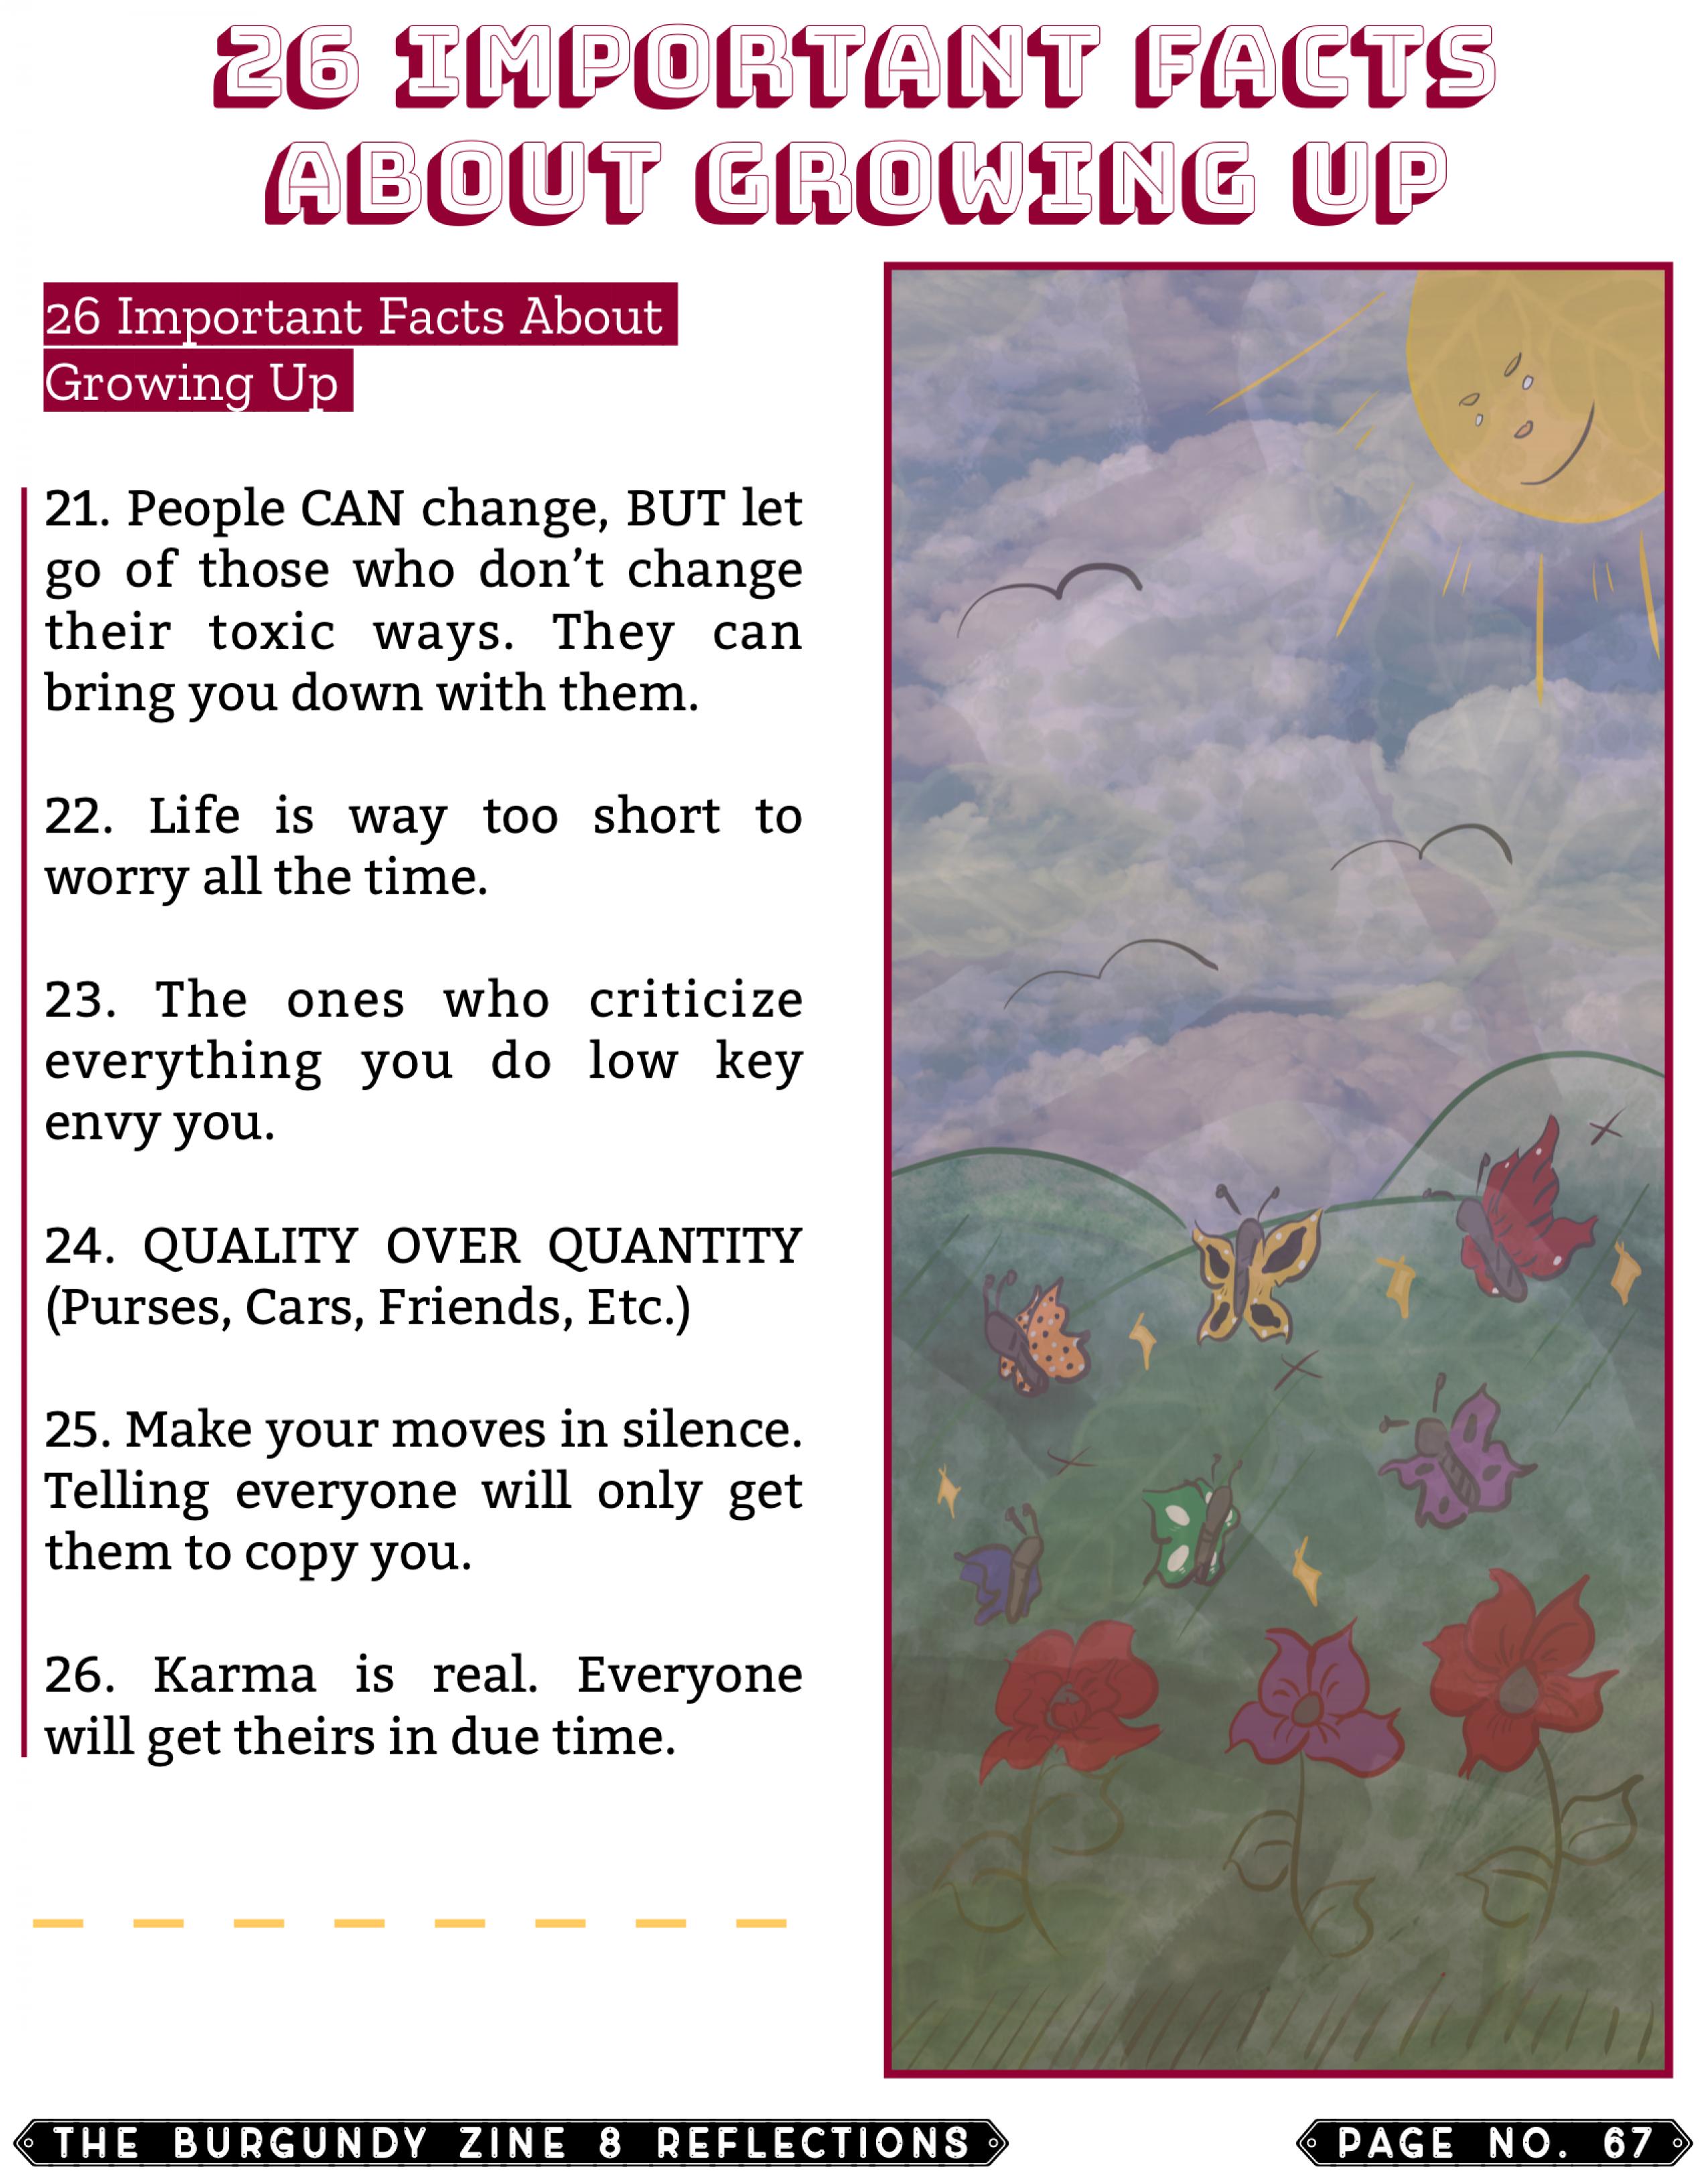 The Burgundy Zine #8 Reflections 067